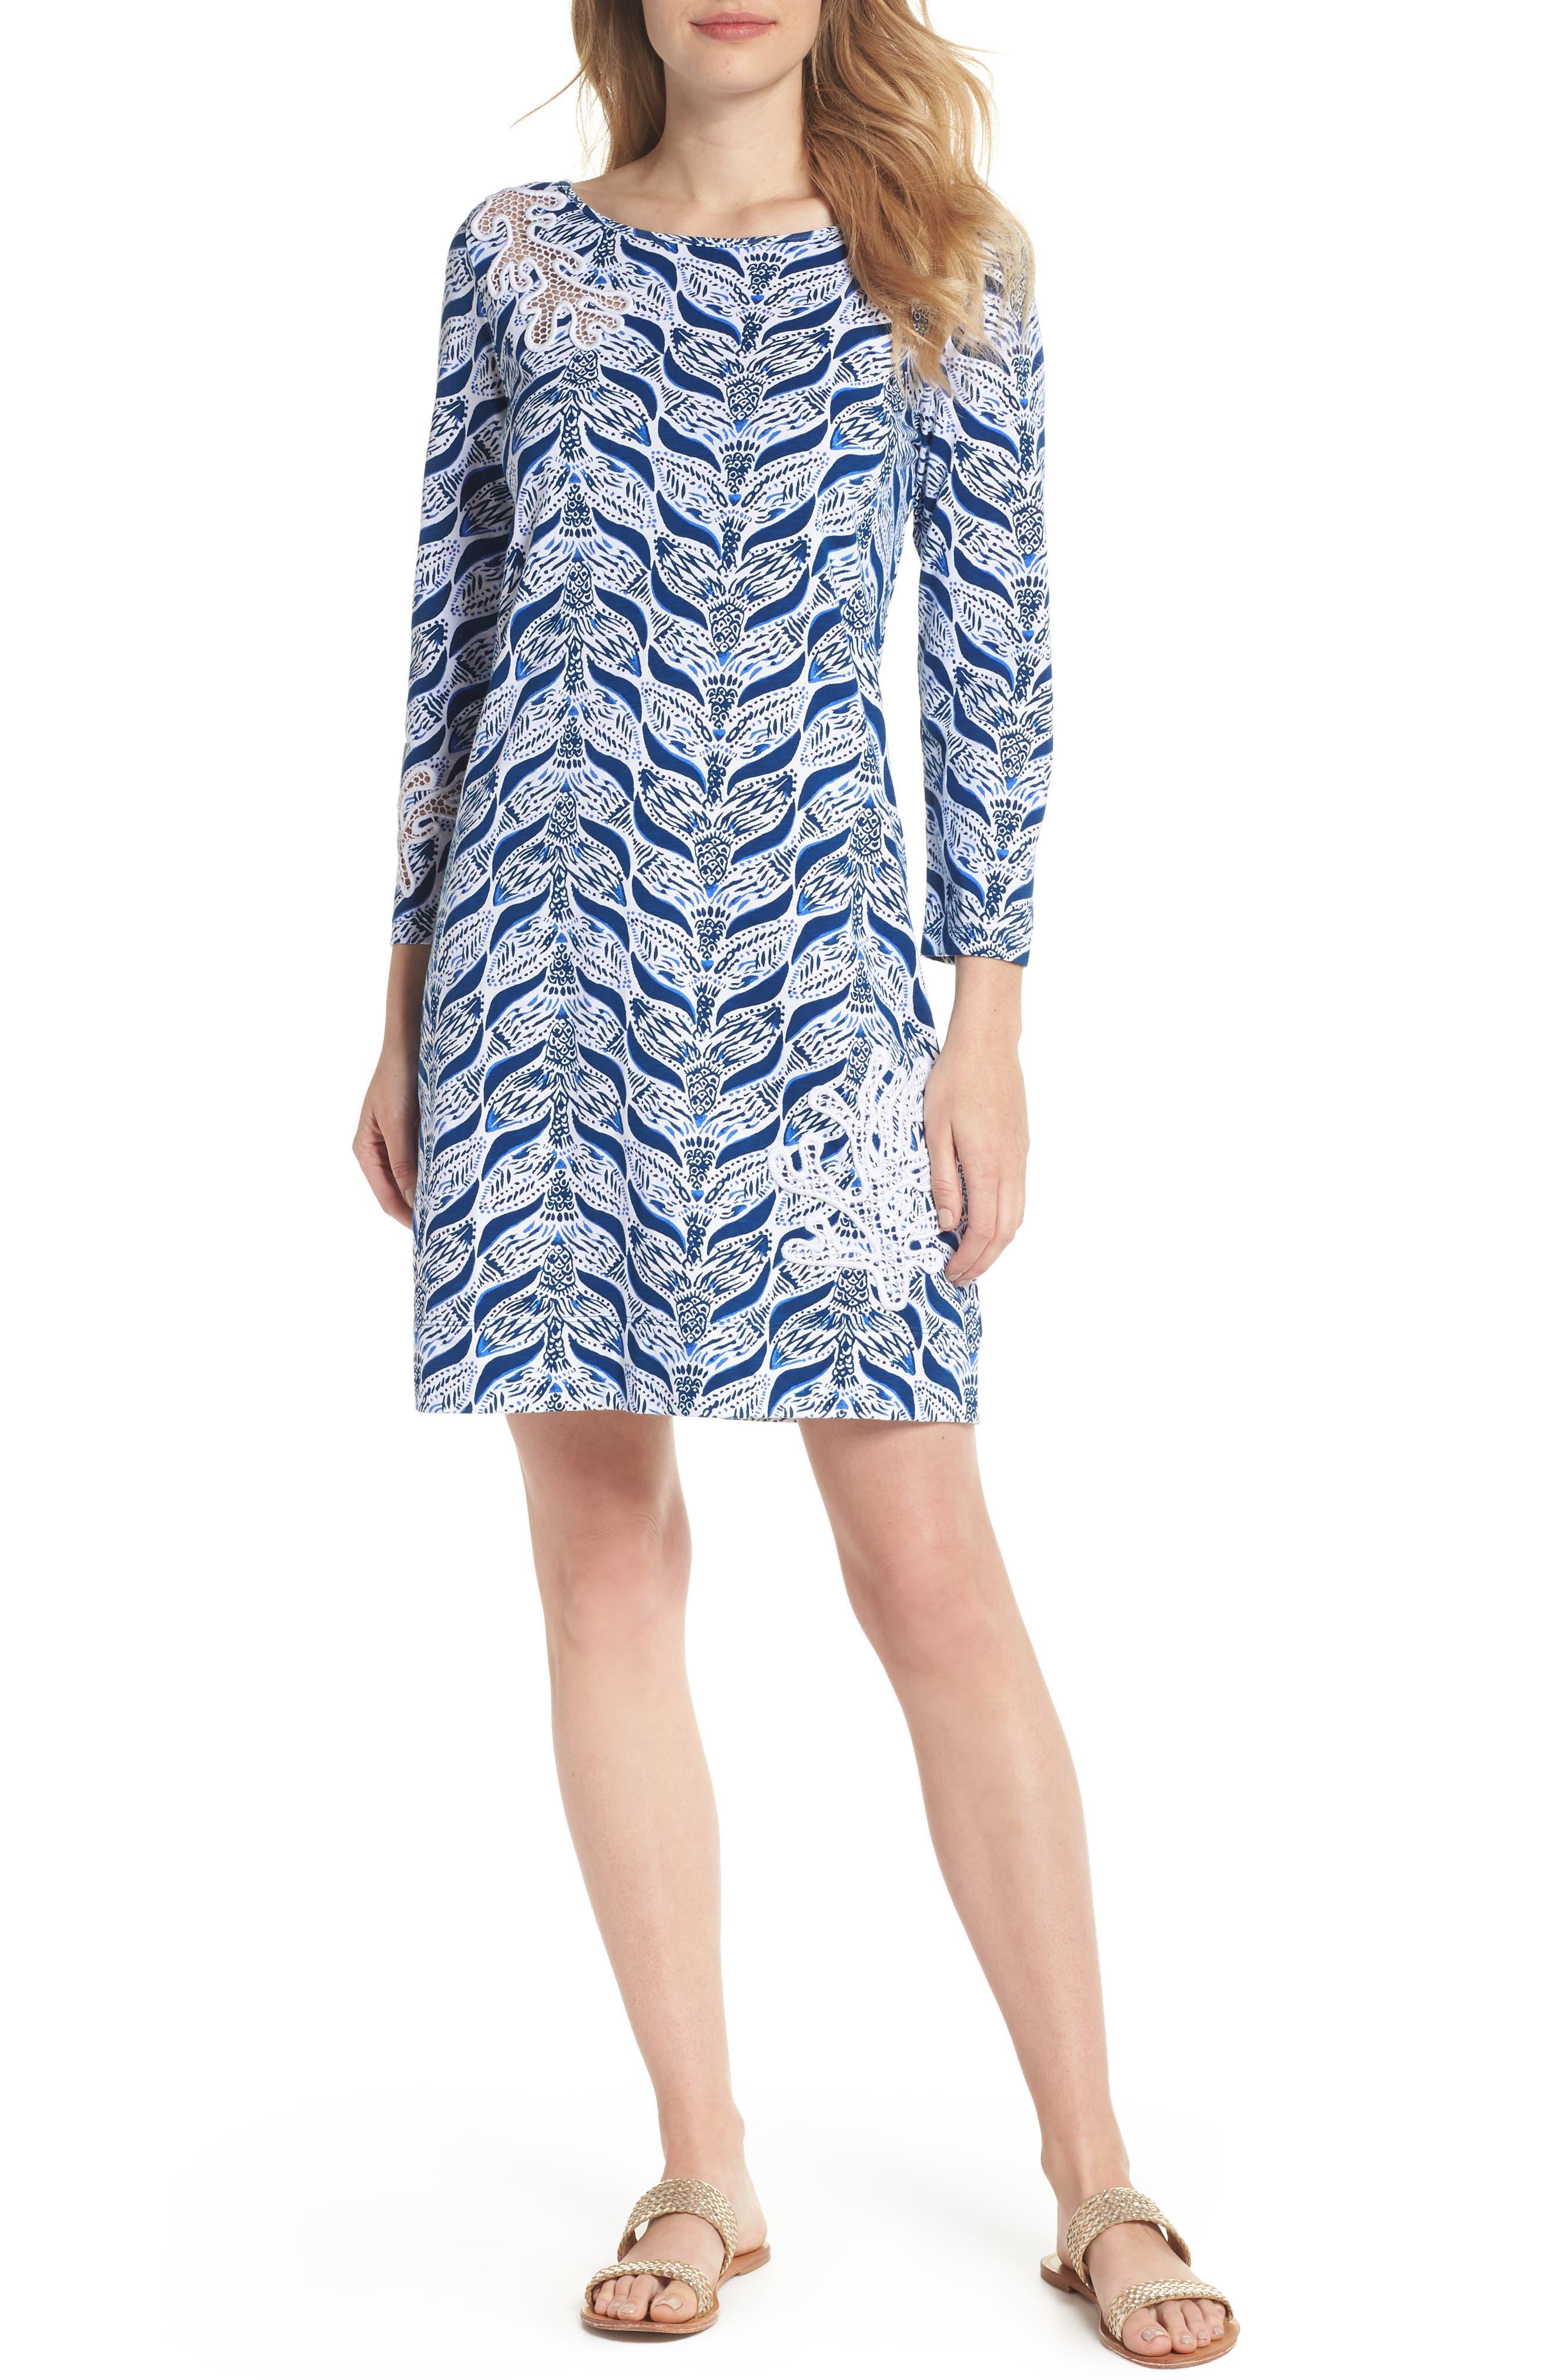 Marlowe T-Shirt Dress,                             Main thumbnail 1, color,                             Resort White A Mermaids Tail